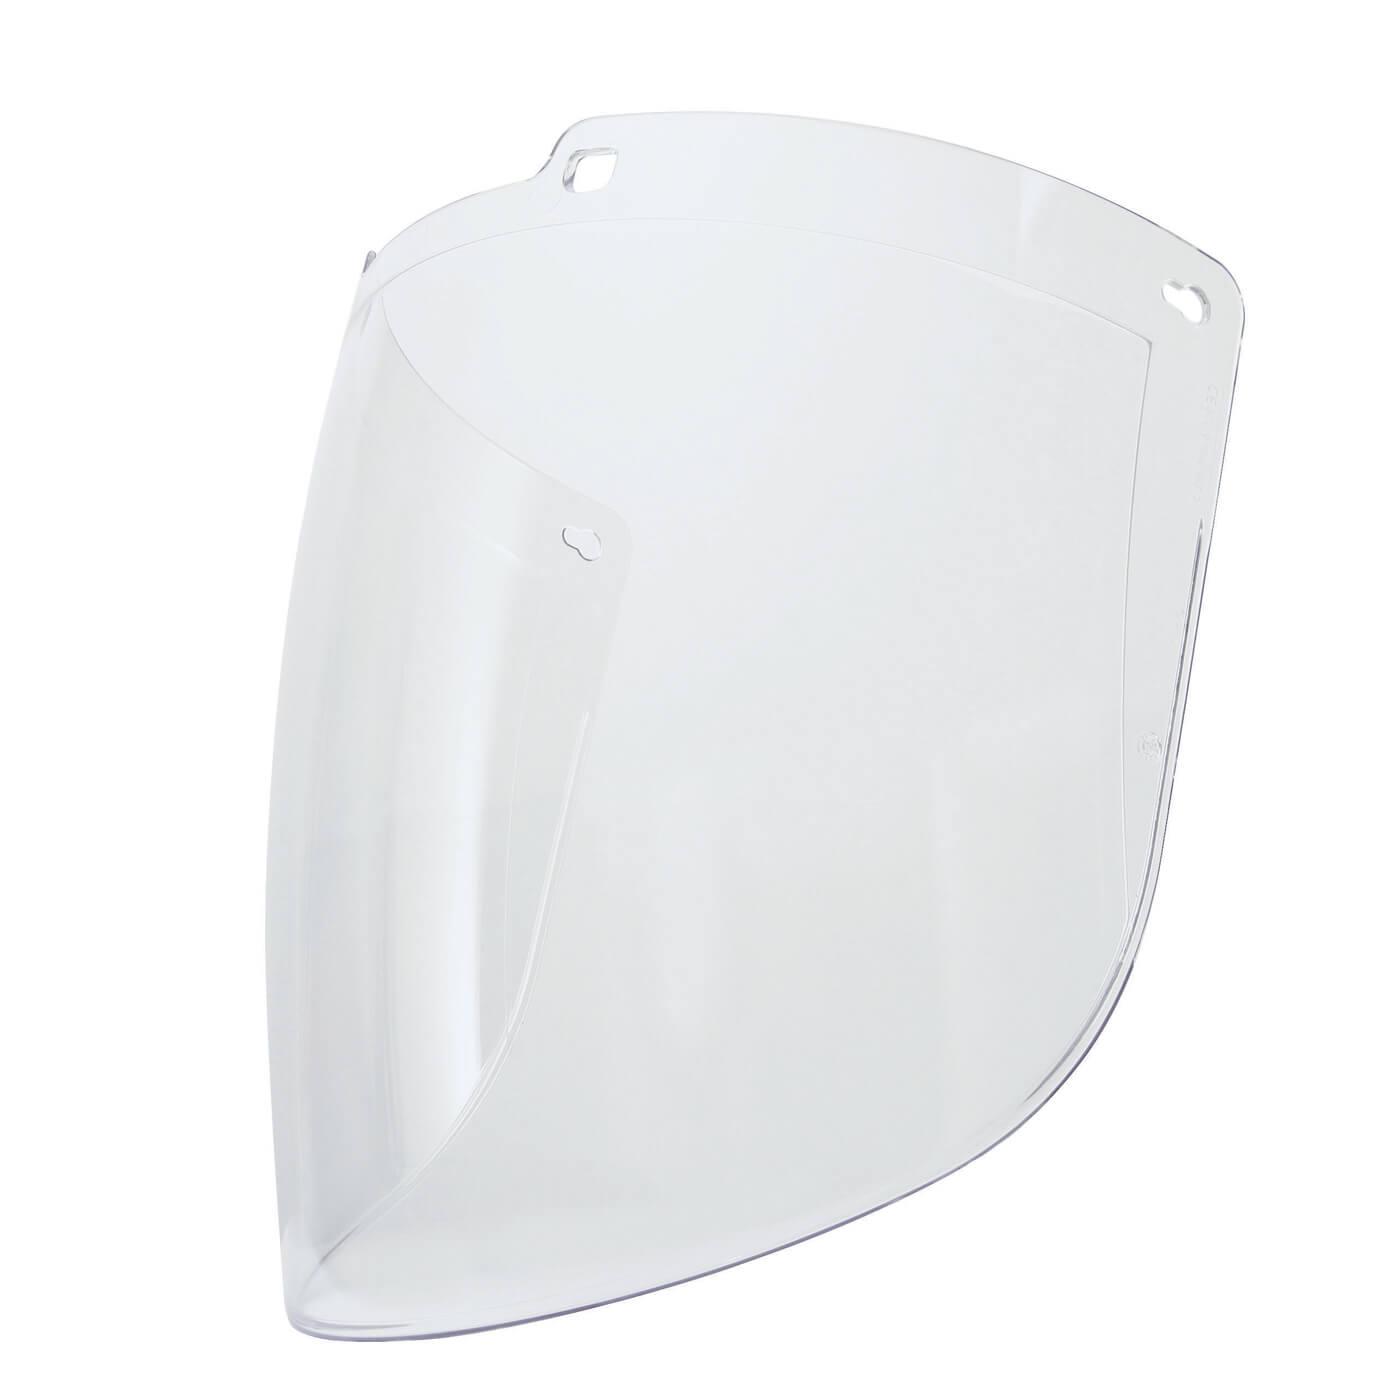 Szyba ochronna UV do osłony Turboshield Honeywell 1031747